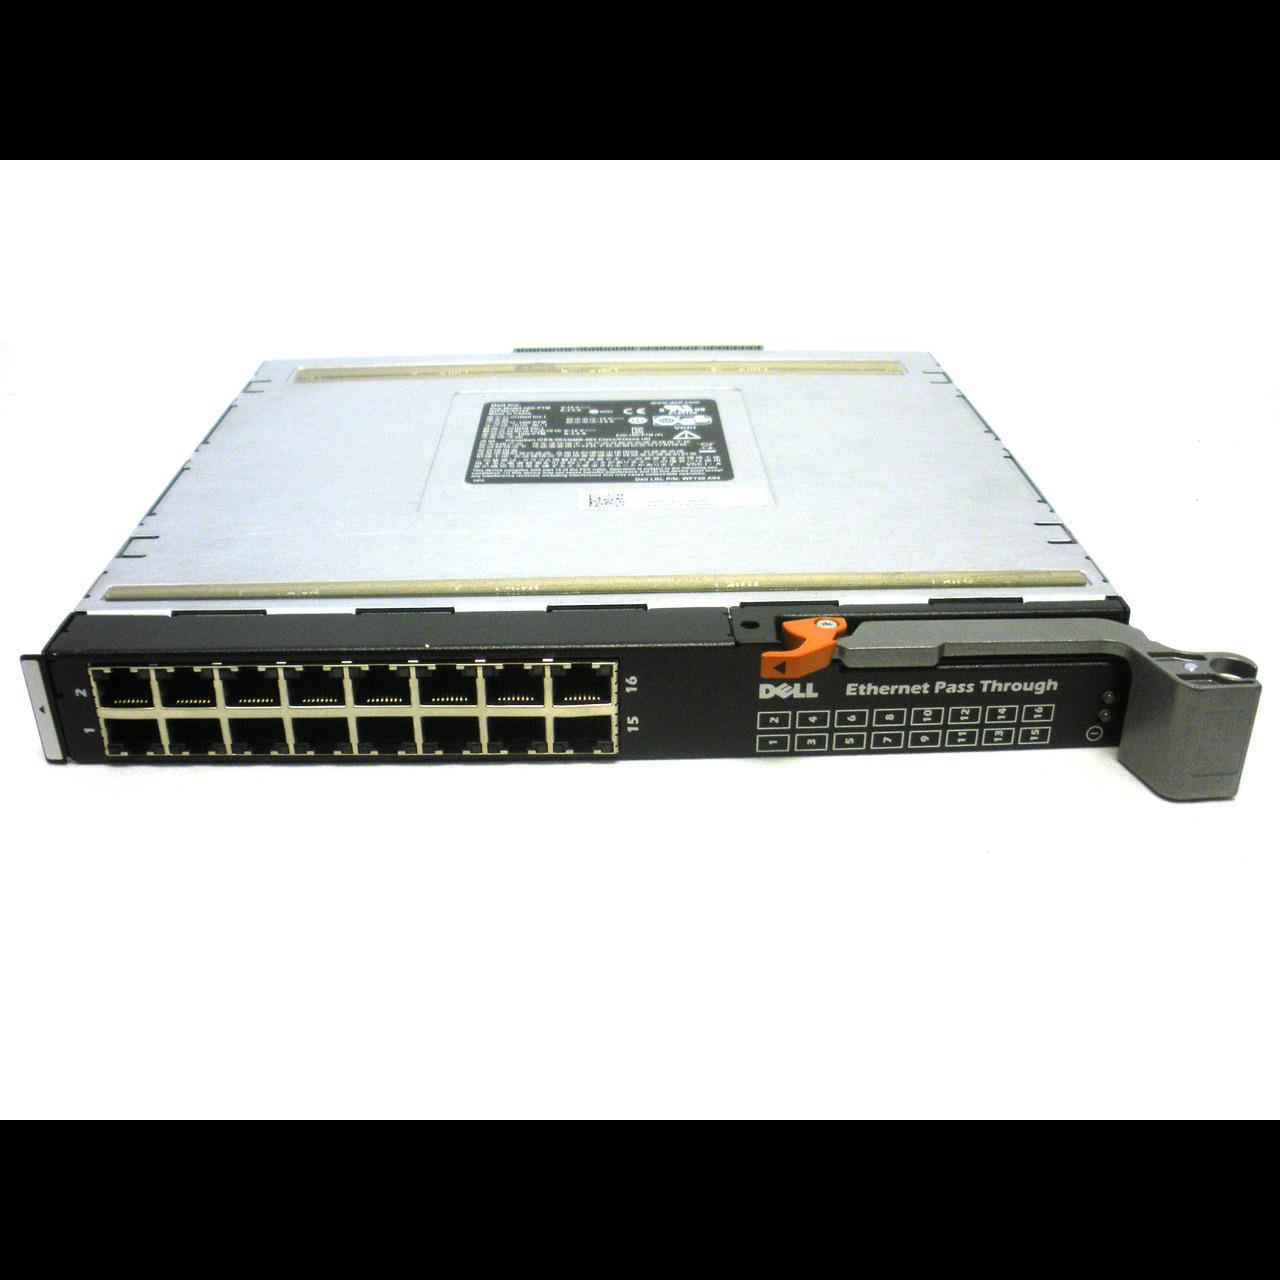 Модуль транзита Ethernet для Dell блейд систем M1000e, 16х 100/1000Base-T